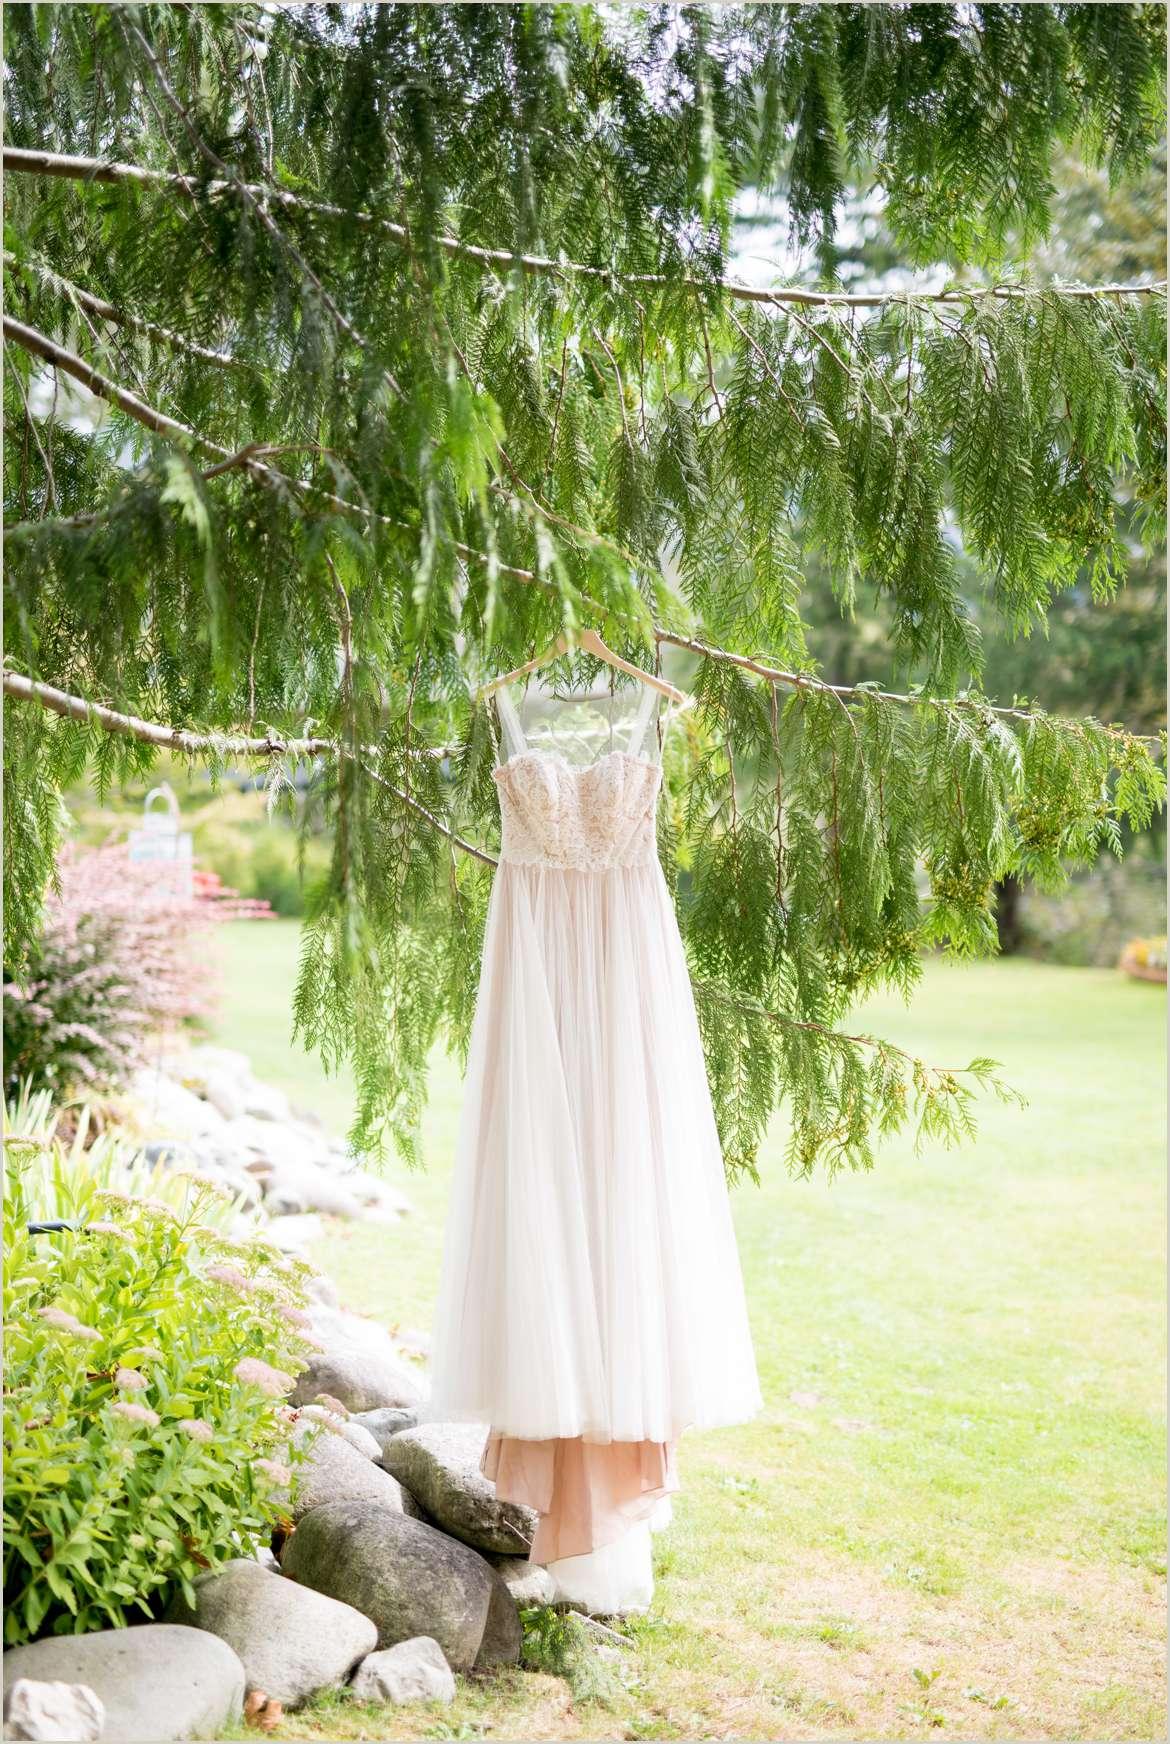 bhldn dress hanging